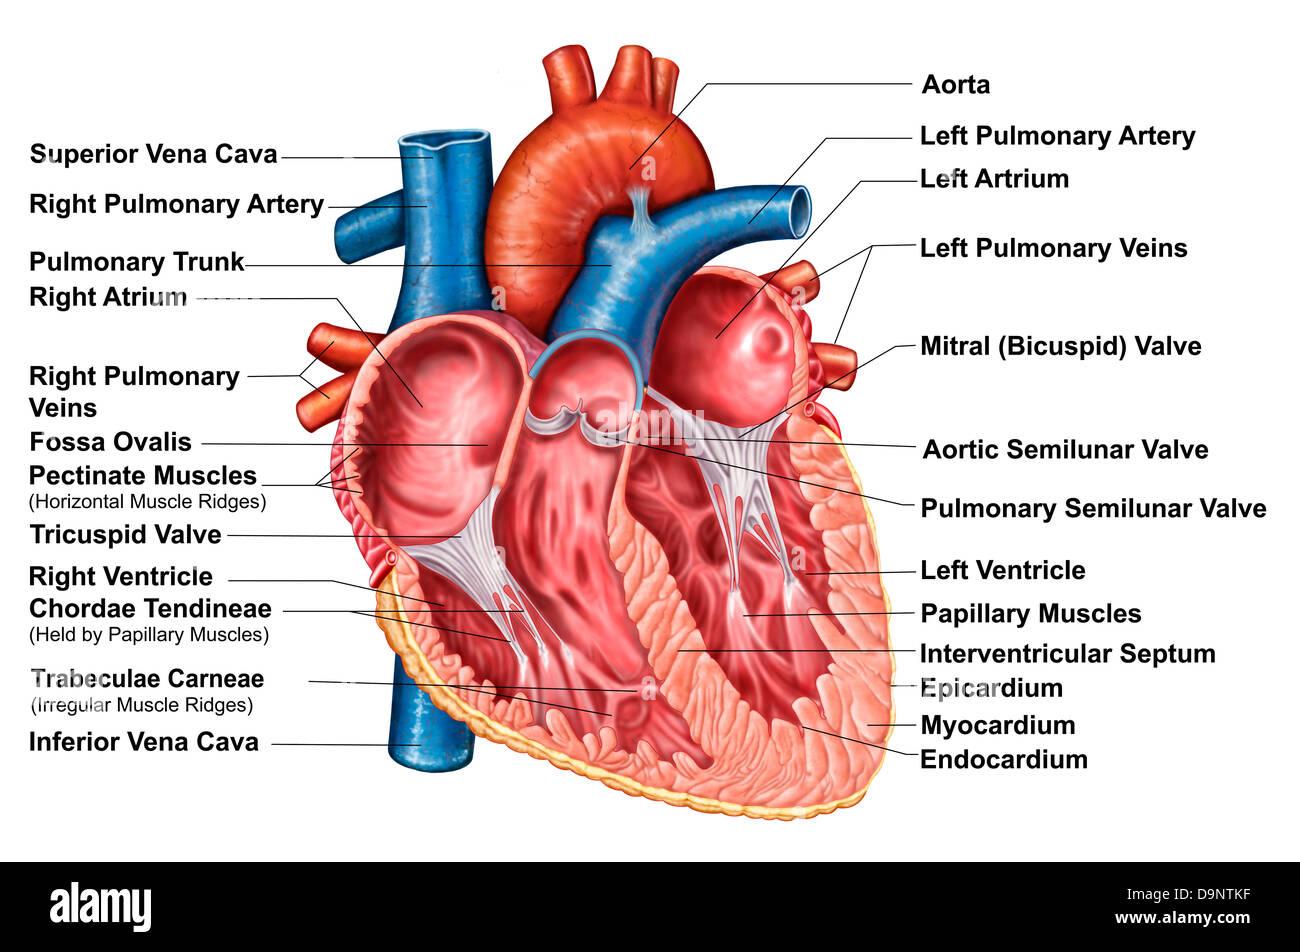 Anatomie des Herzens Interieur, frontalen Abschnitt Stockfoto, Bild ...